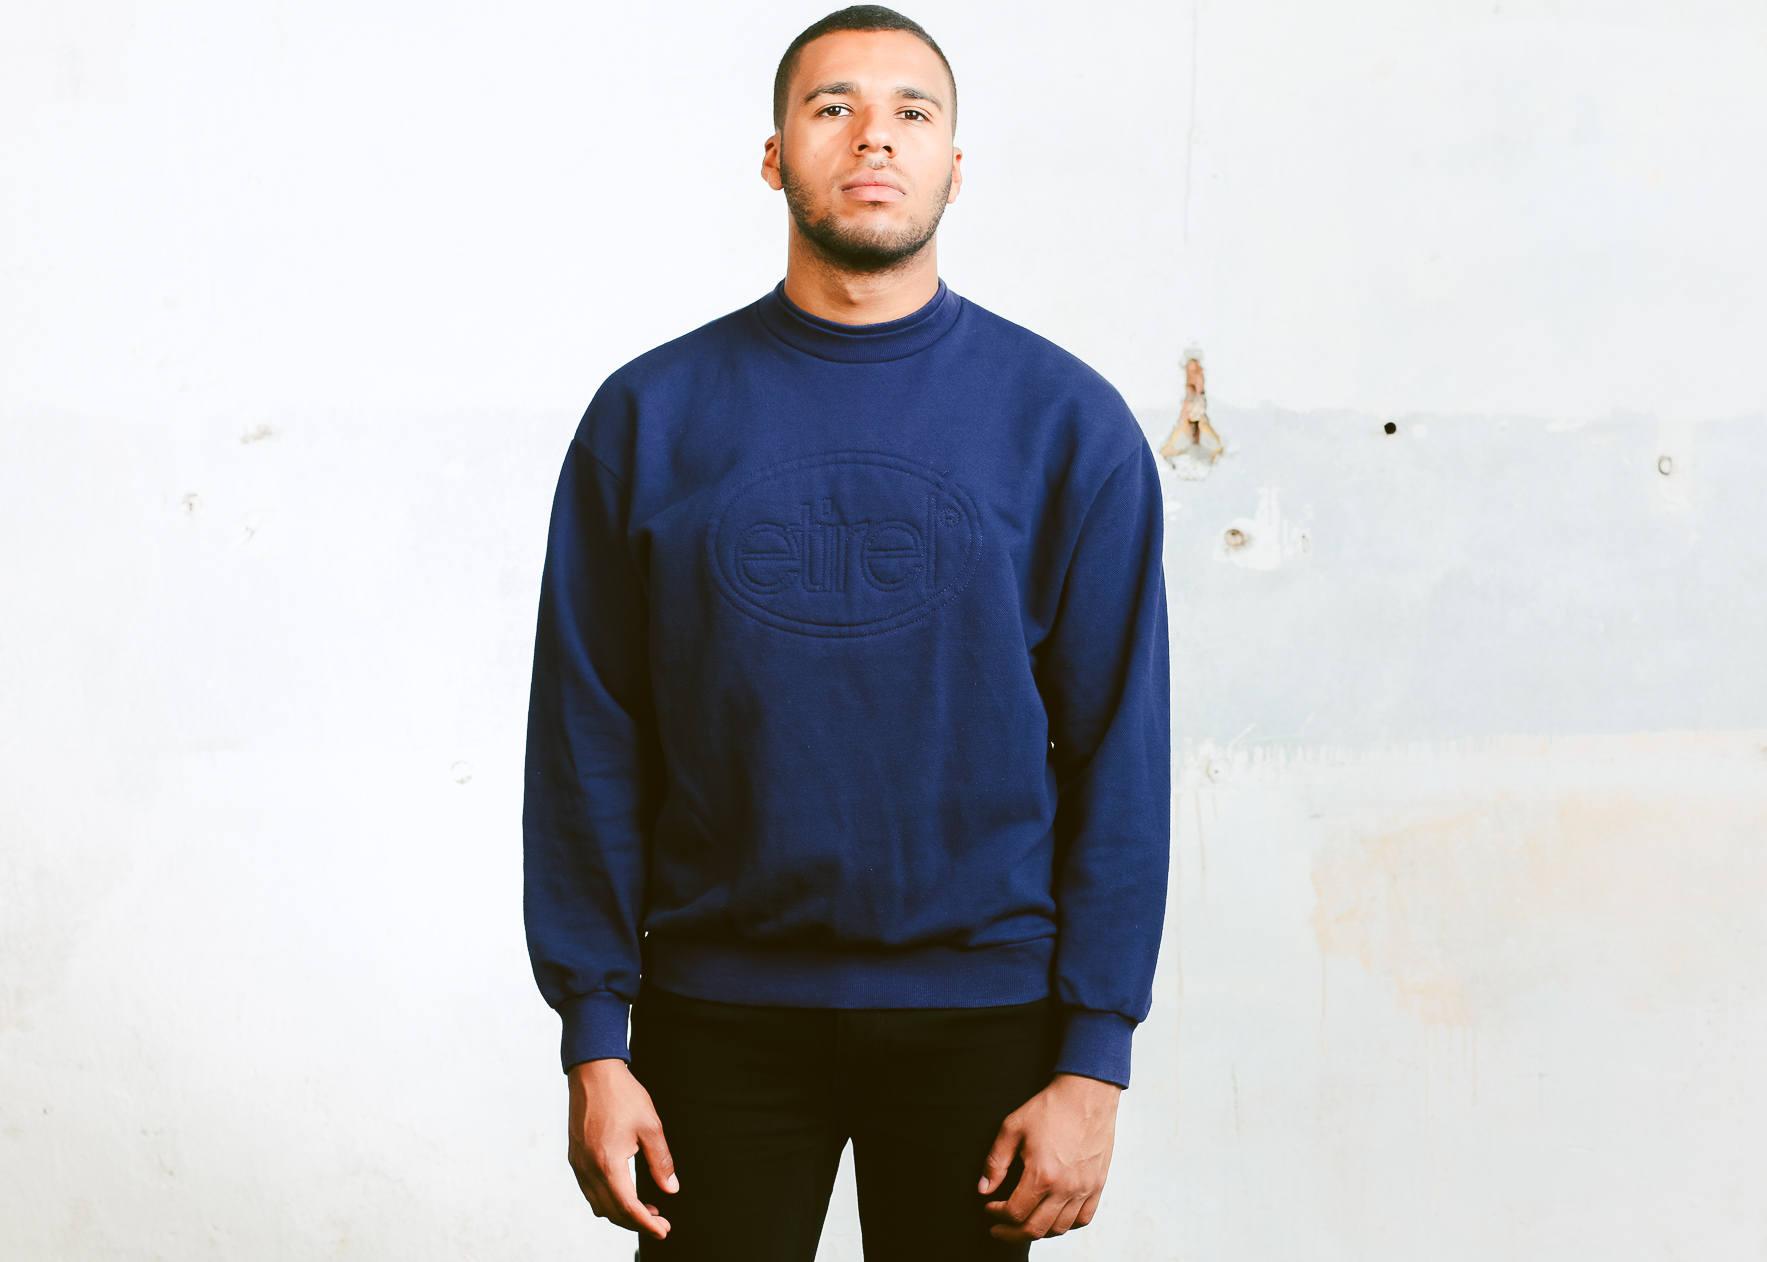 90s Etirel Sweatshirt Vintage Blue Sweater Men Retro Hipster Baggy Mens Clothes Boyfriend Gift Size Large